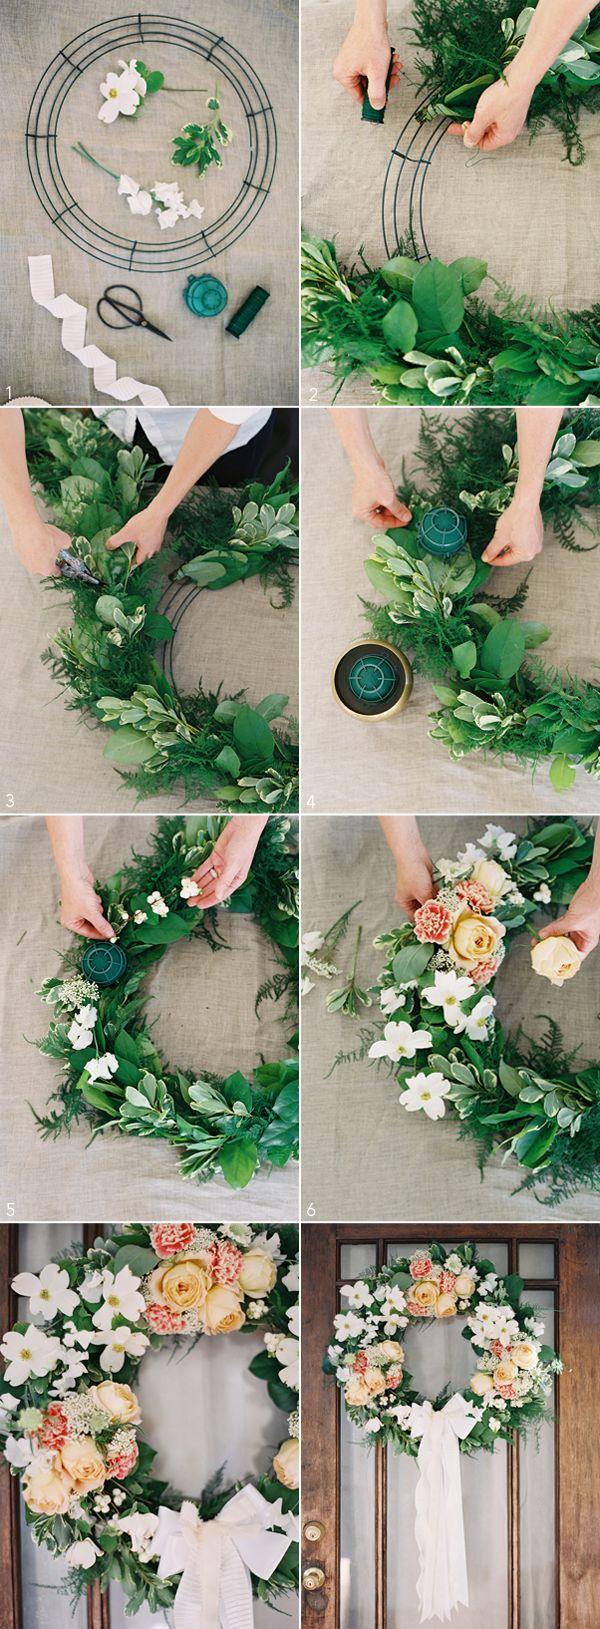 Wedding Decor Diy Ideas 20 Creative Diy Wedding Ideas For 2016 Spring